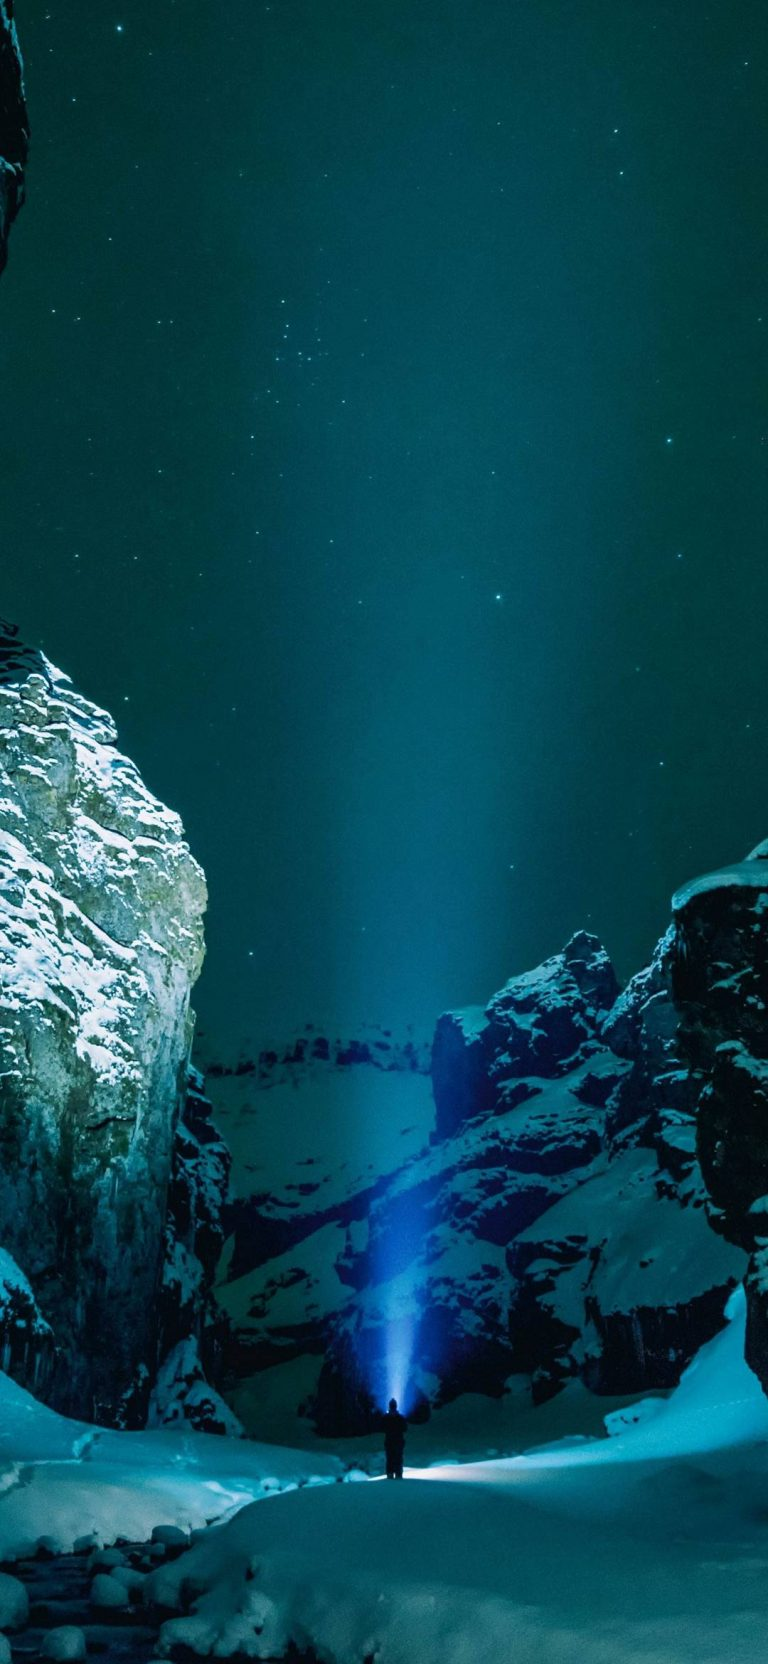 Underwater Snow Wallpaper 1080x2340 768x1664